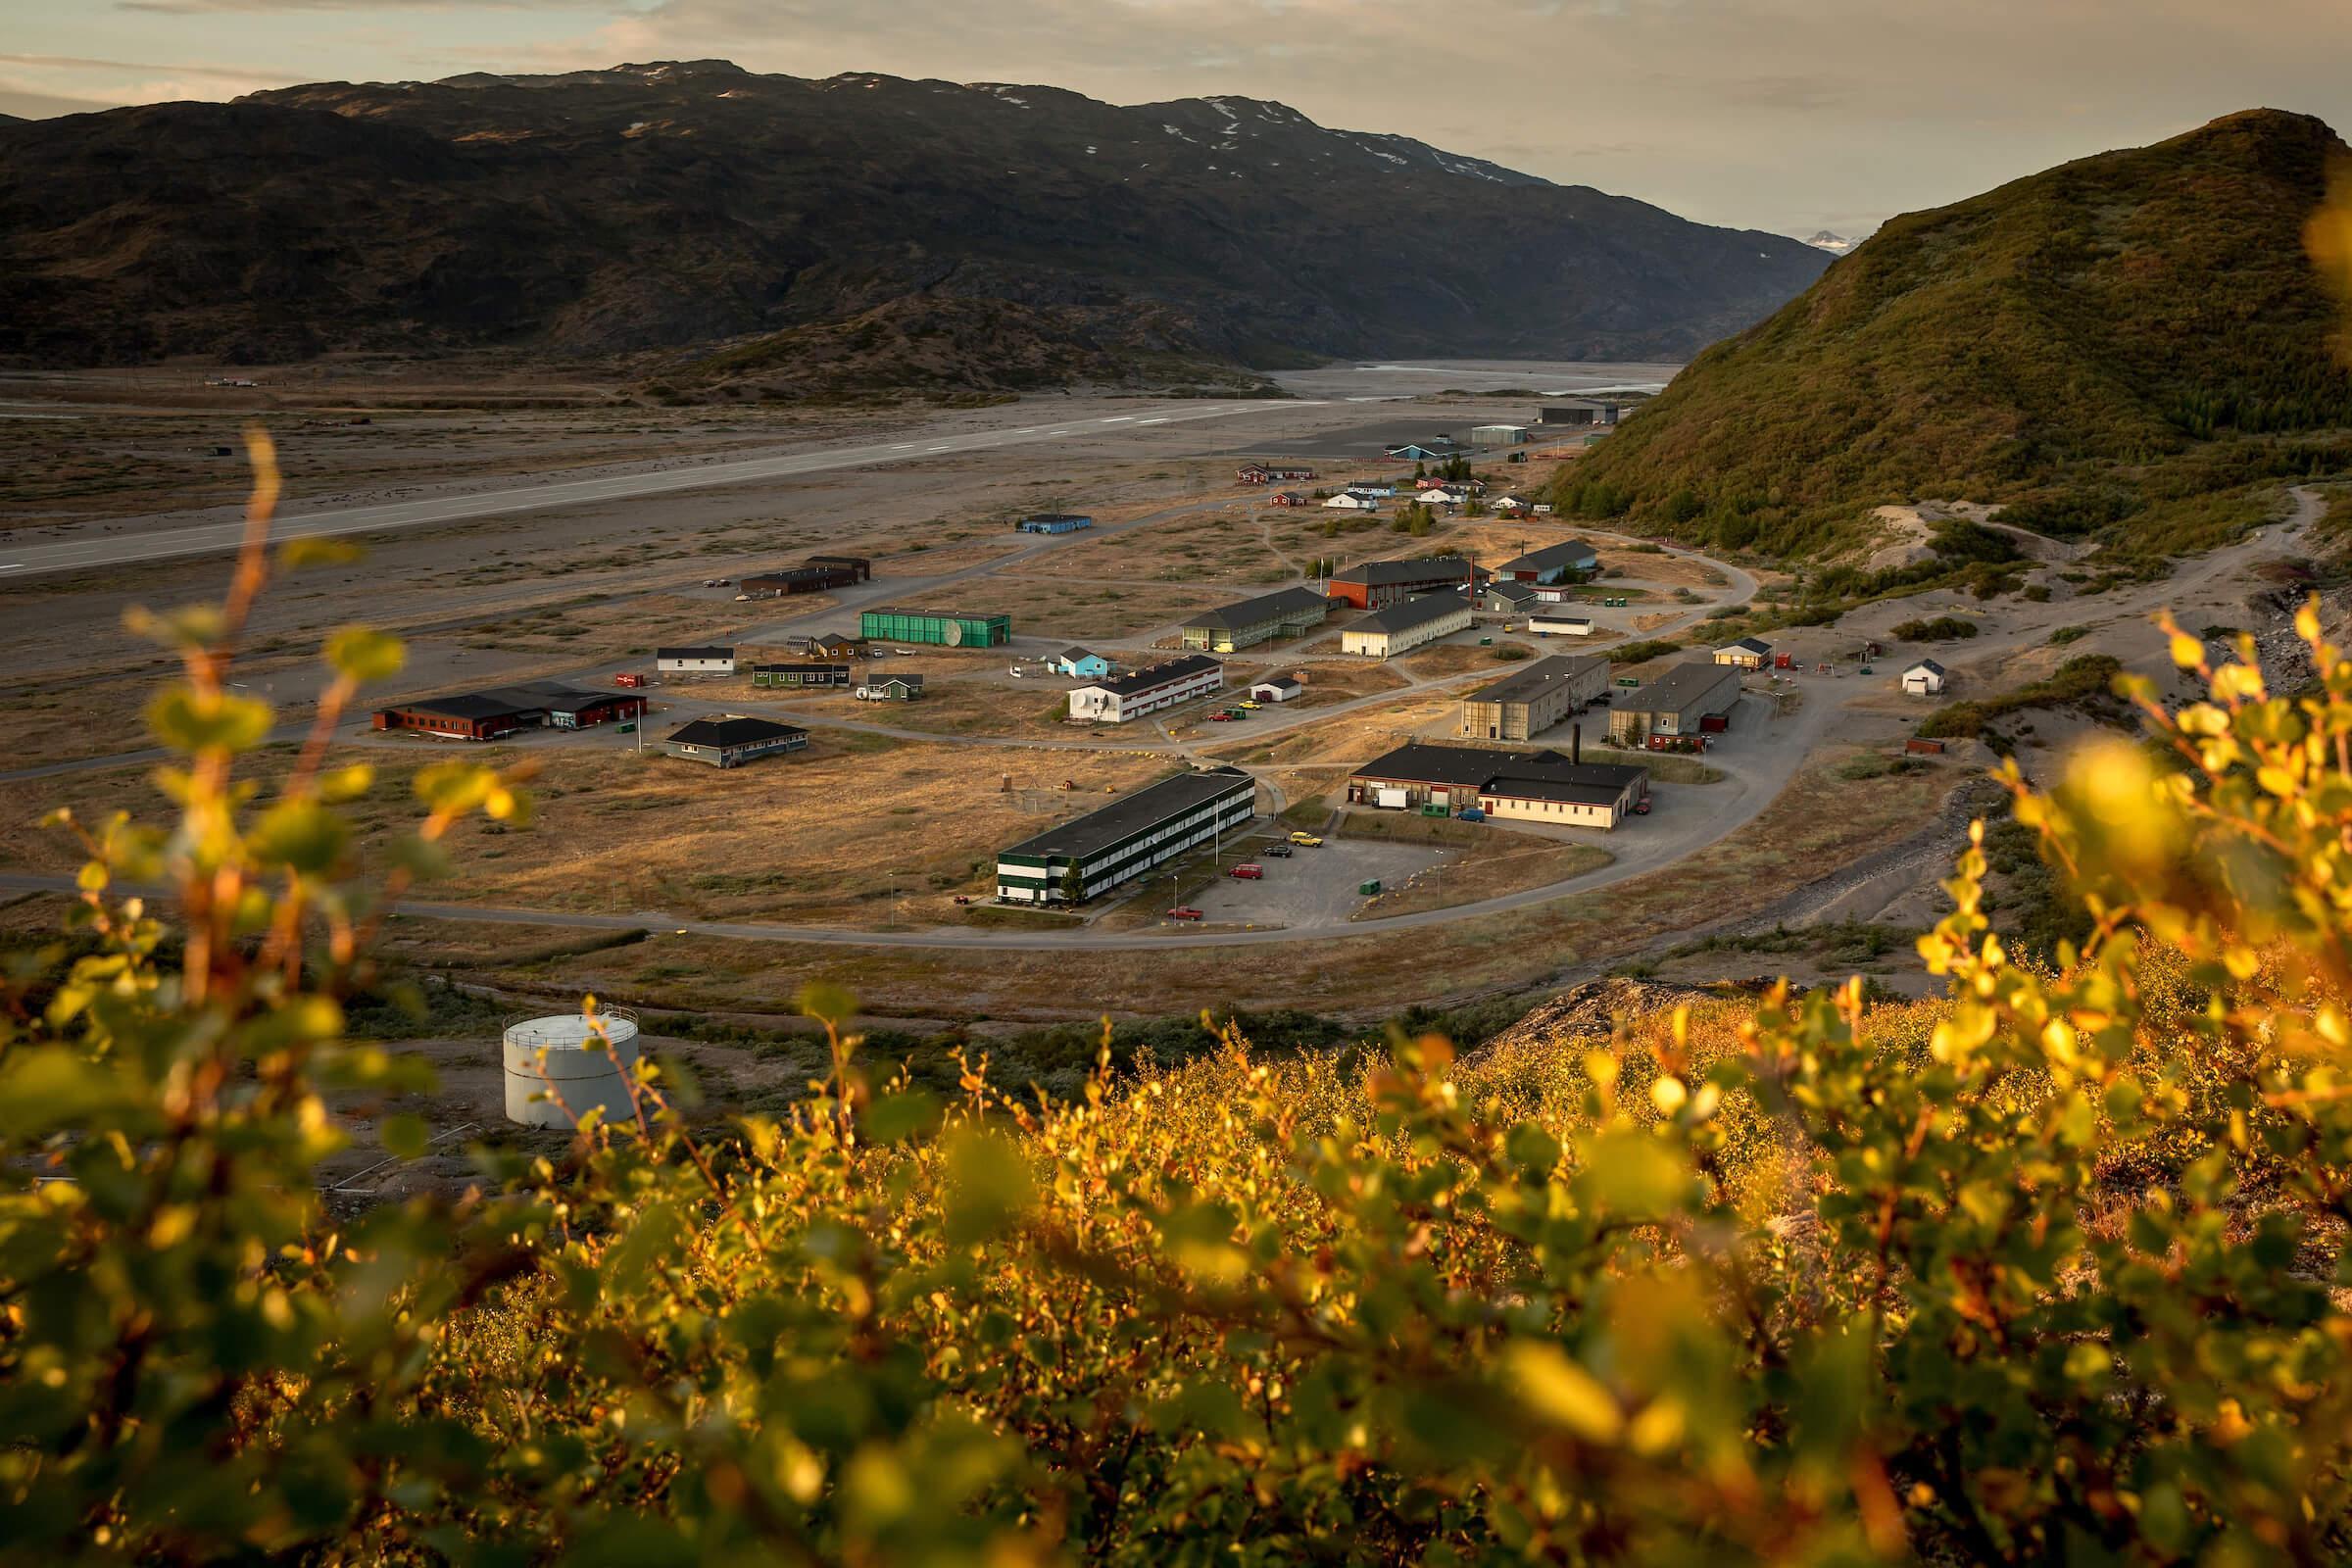 Narsarsuaq in South Greenland at sunset. Photo by Mads Pihl - Visit Greenland